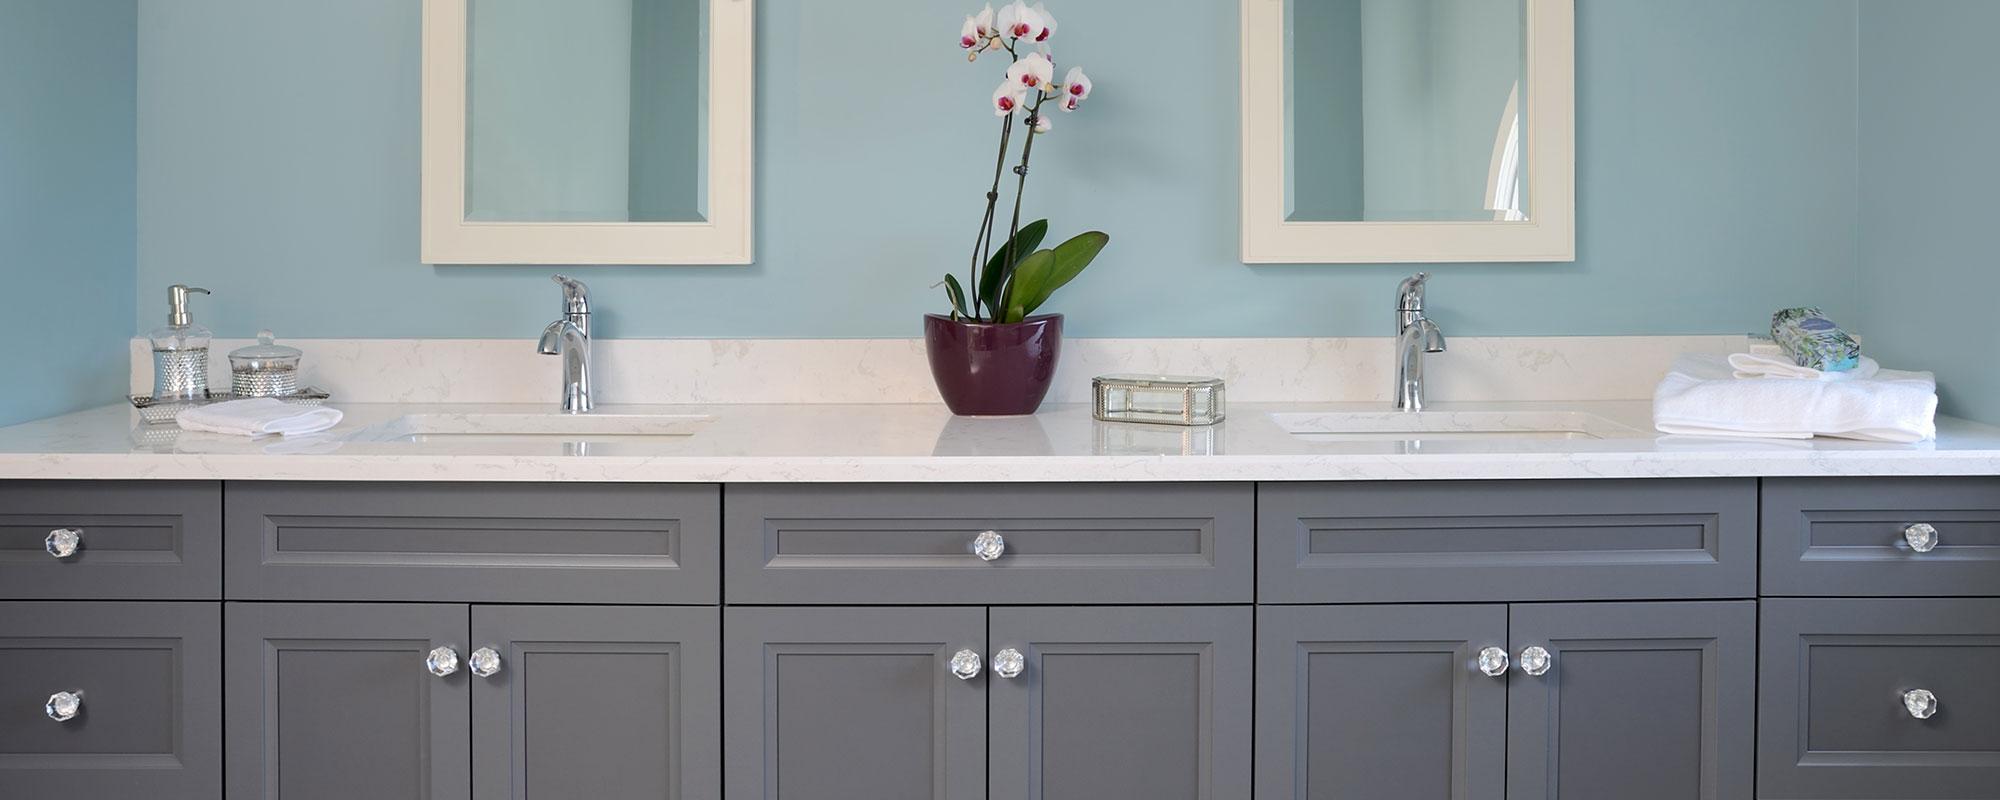 Farrow Crescent Family Bathroom Renovation